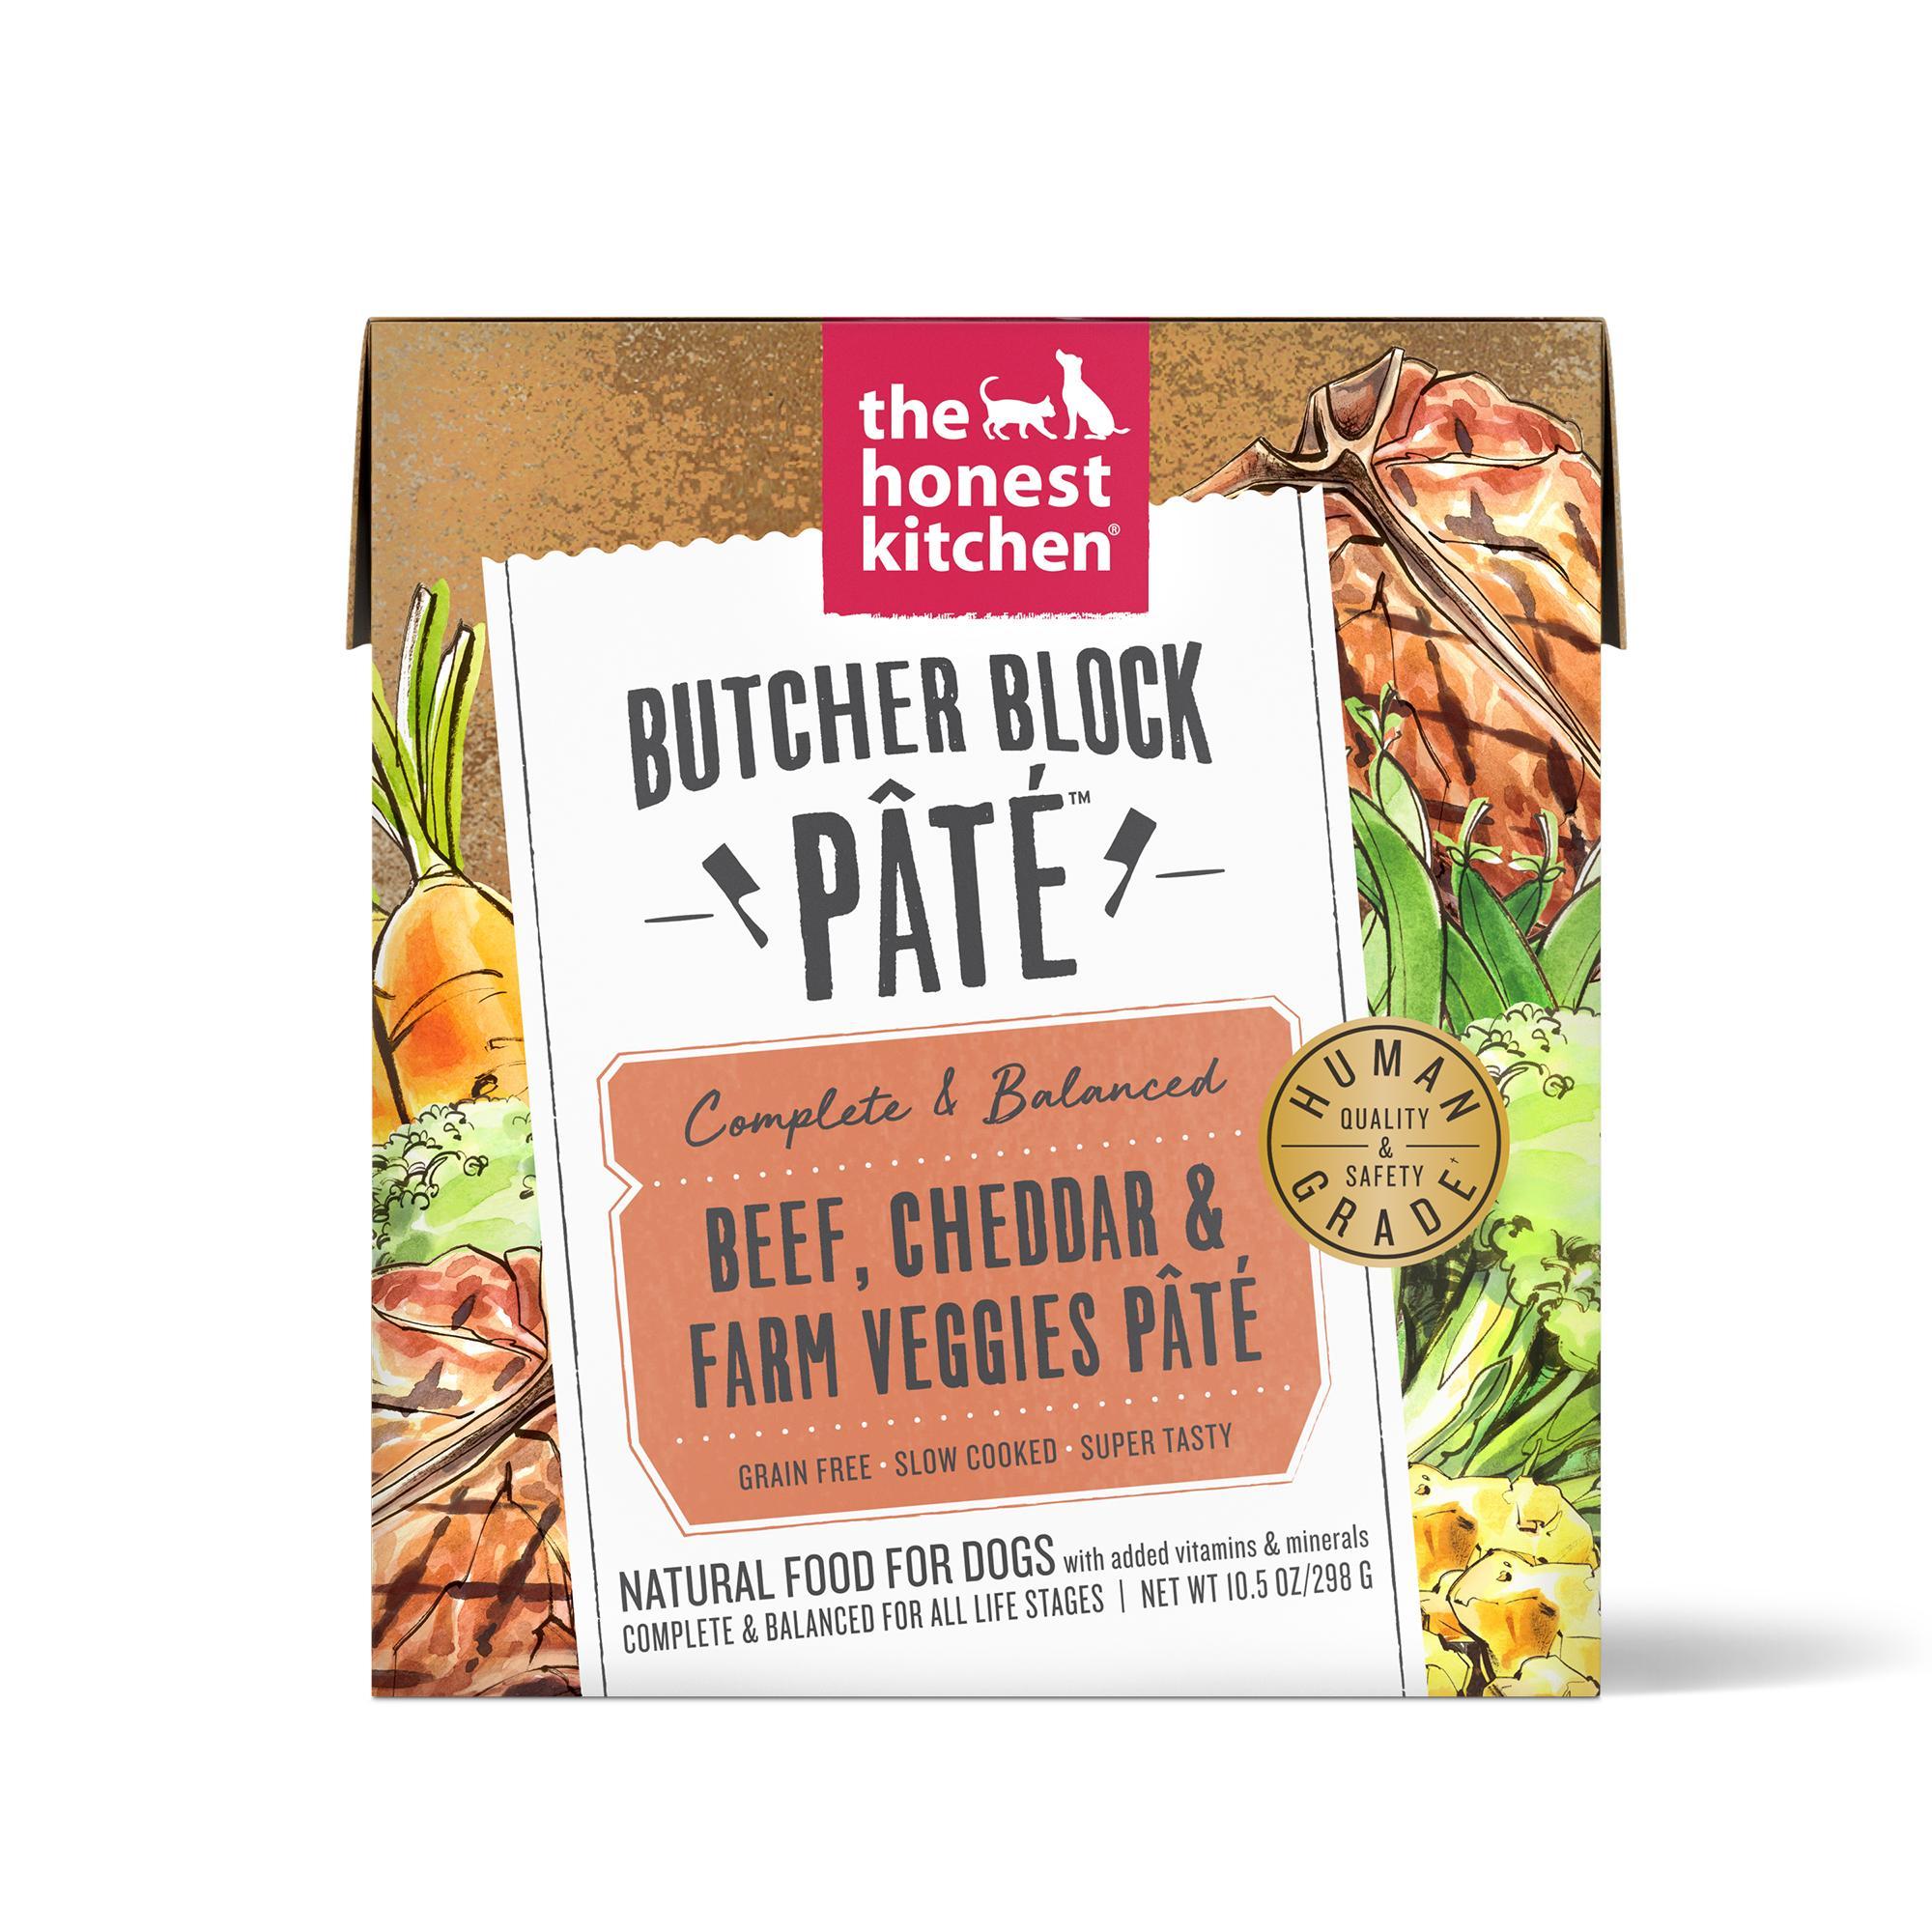 The Honest Kitchen Butcher Block Pate Beef, Cheddar & Farm Veggies Wet Dog Food, 10.5-oz